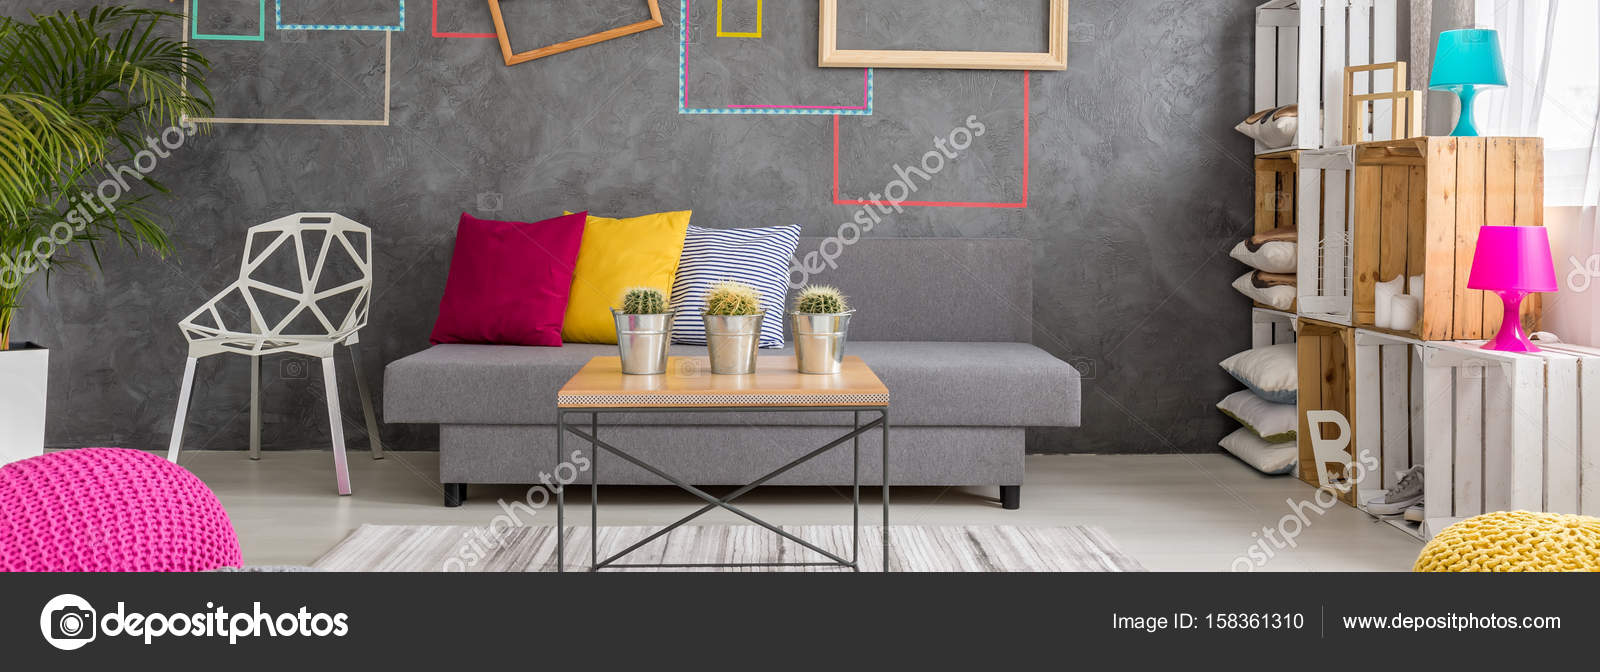 Kreative Wohnzimmer Dekor — Stockfoto © photographee.eu #158361310